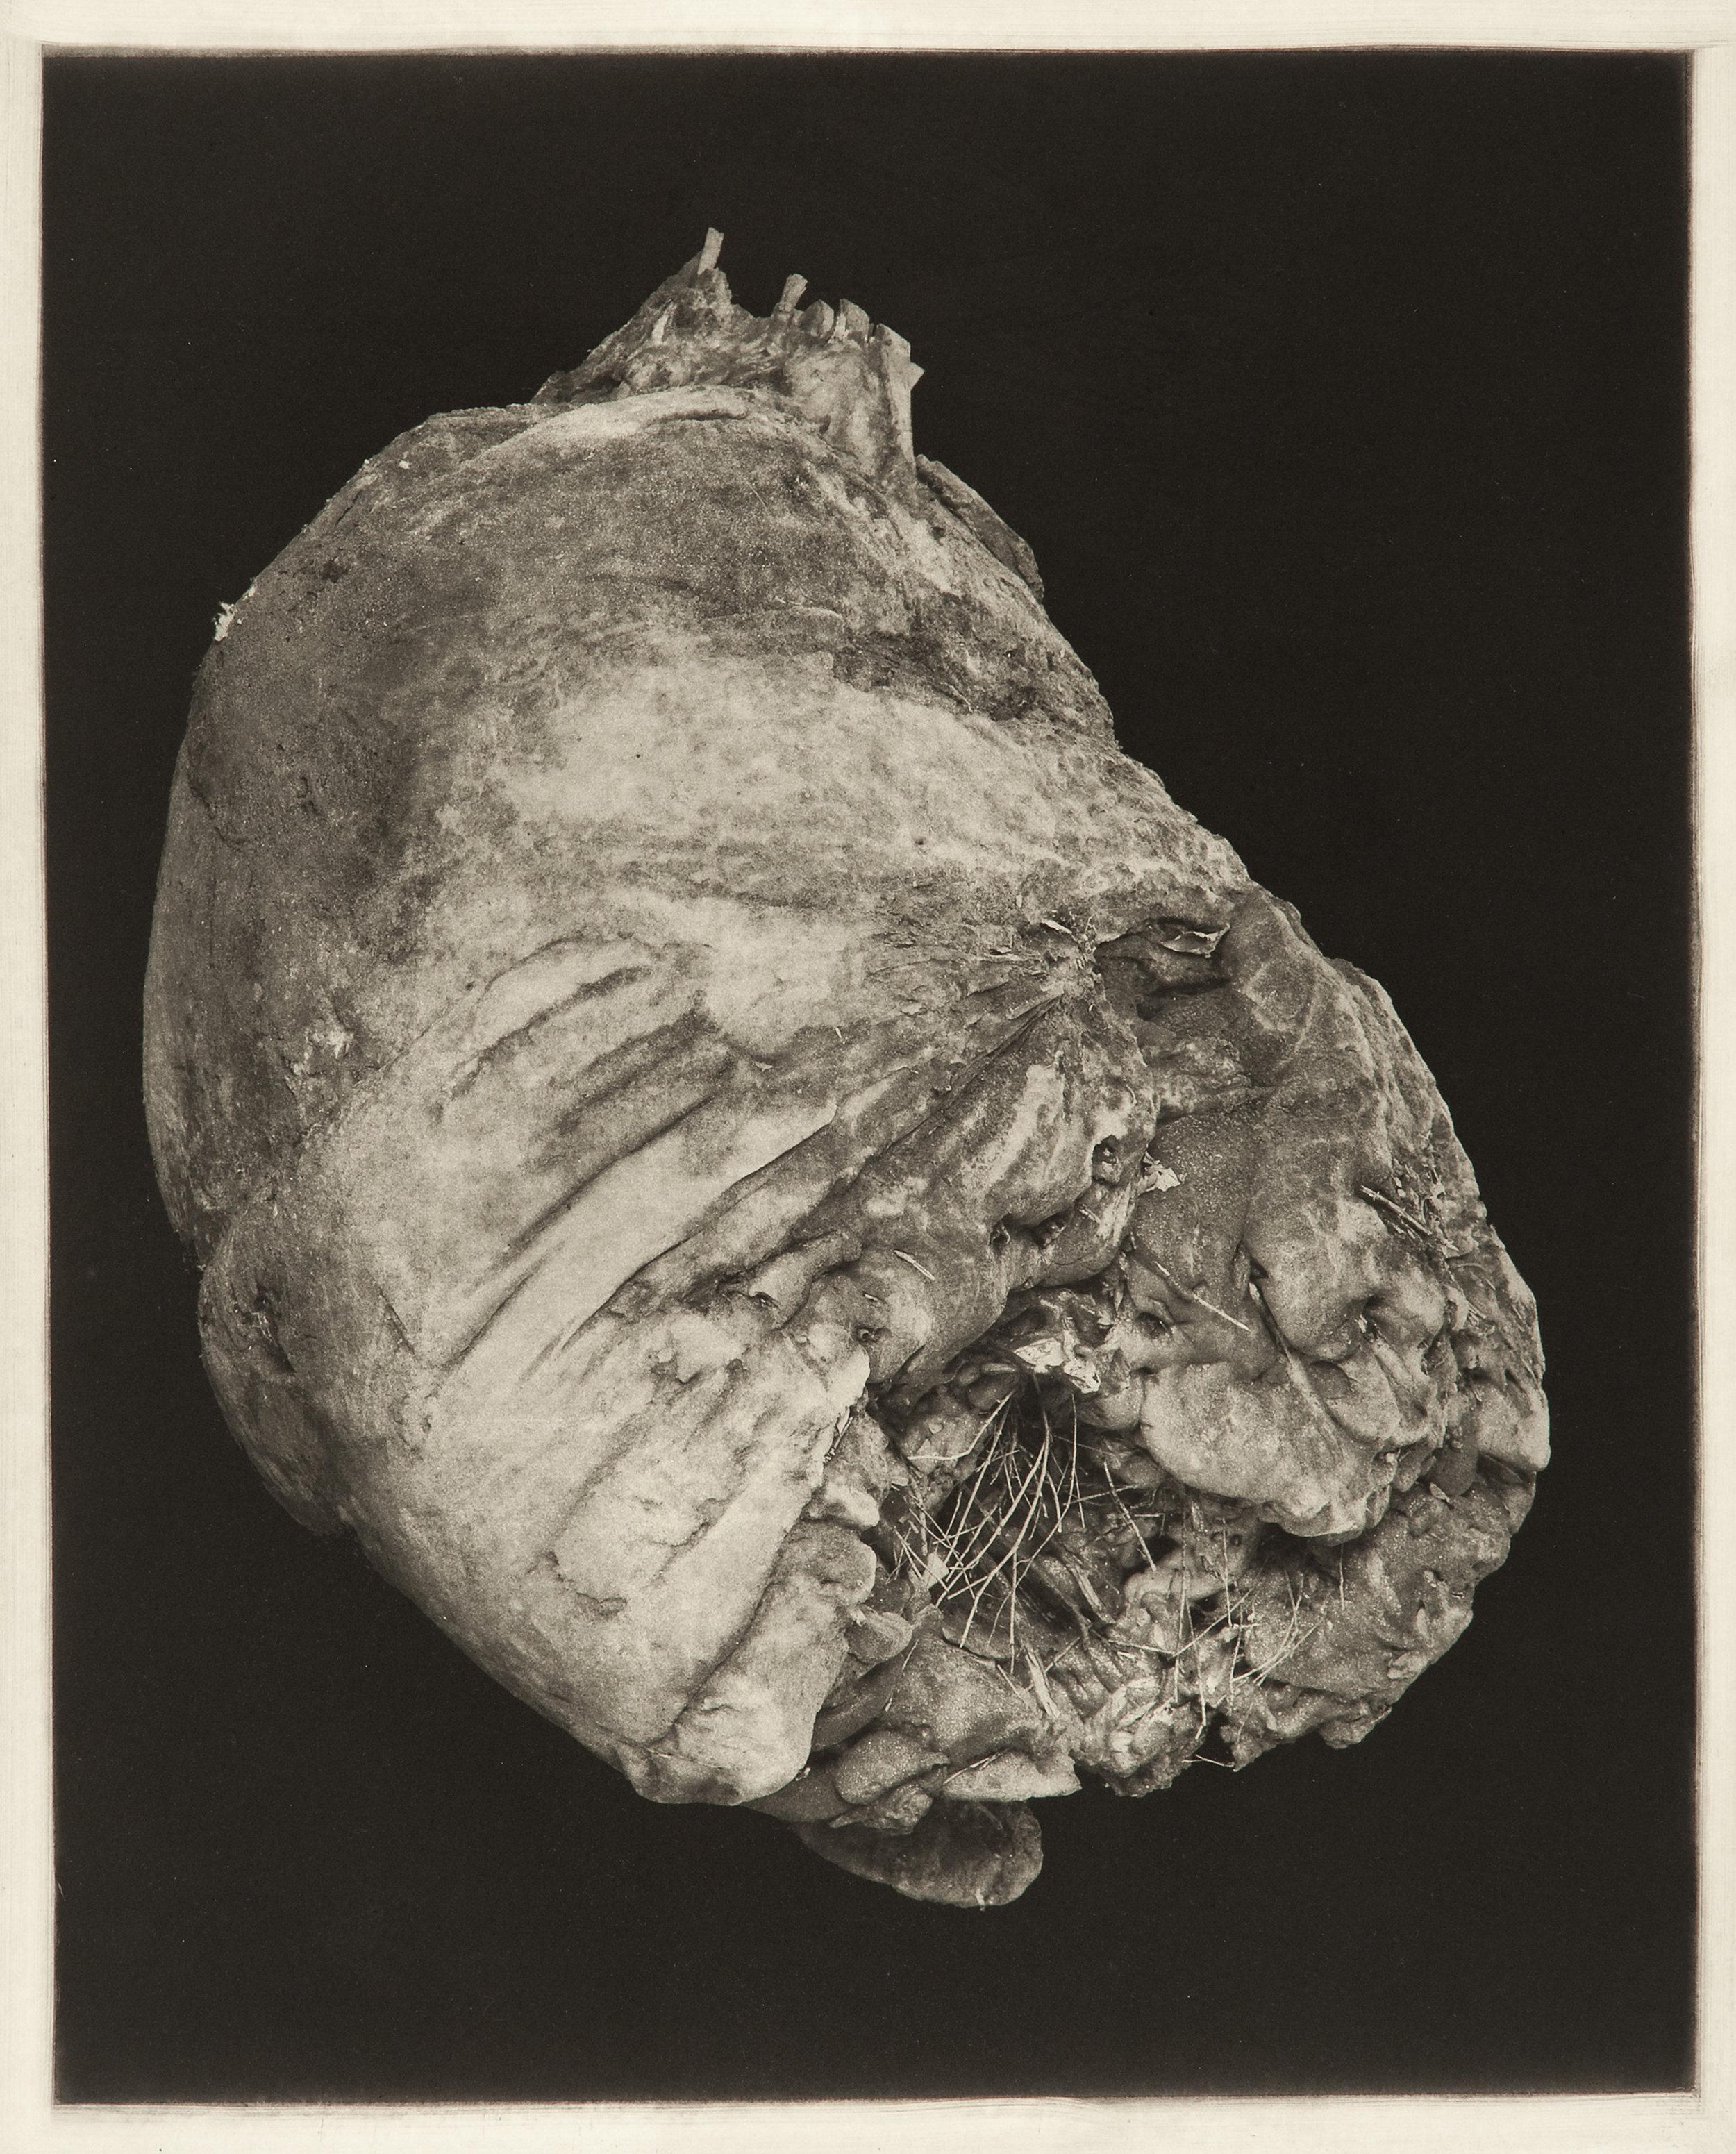 """Degeneration # 4472"", 22"" x 30"", photogravure of urethane sculpture weathered"